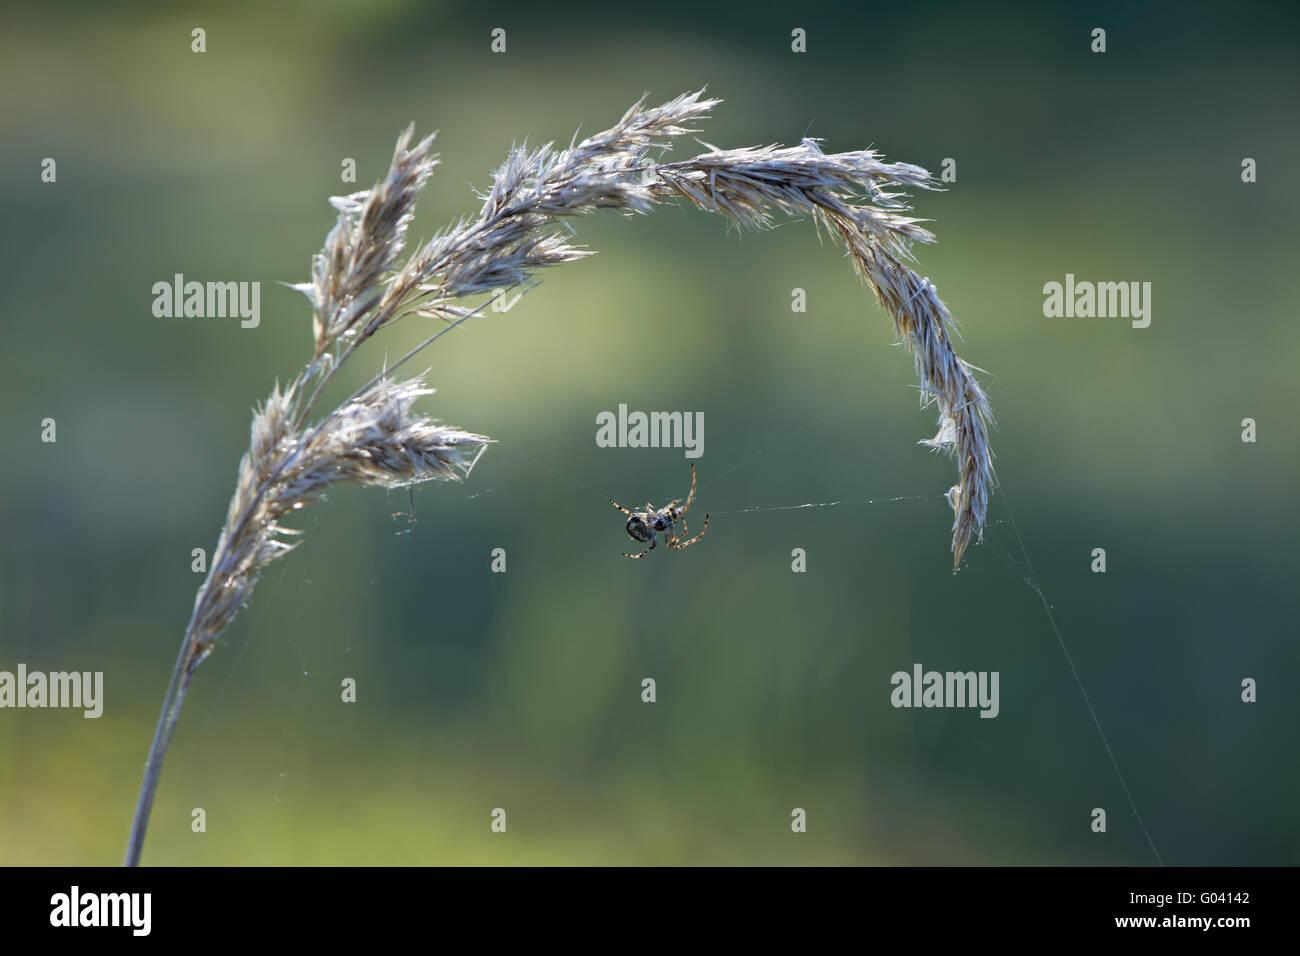 Spider - Stock Image